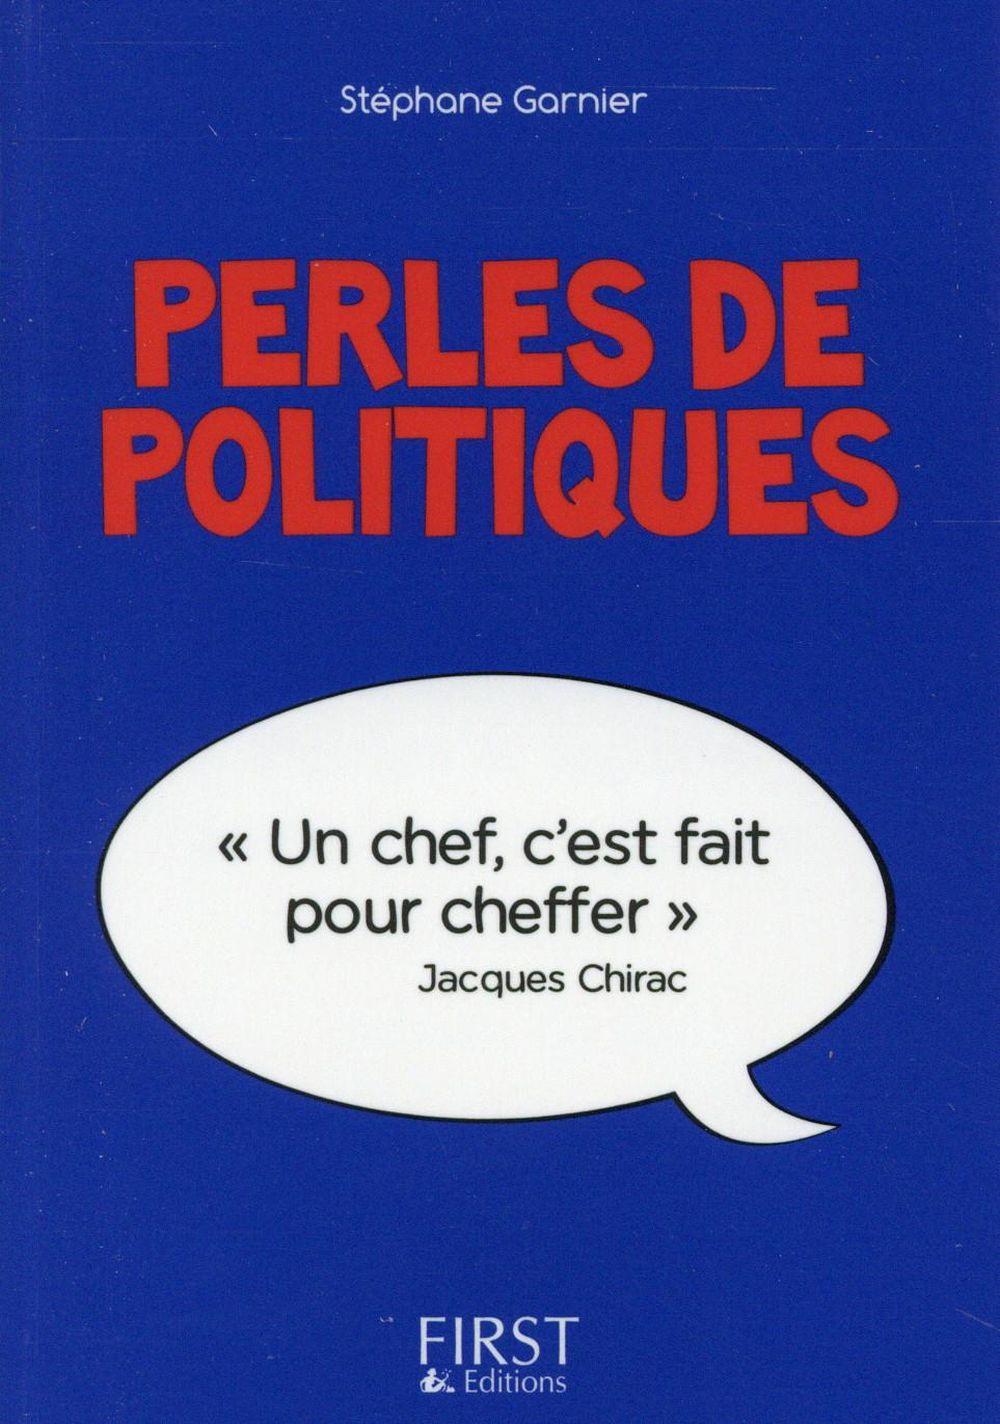 PETIT LIVRE DE - PERLES DE POLITIQUES GARNIER STEPHANE First Editions